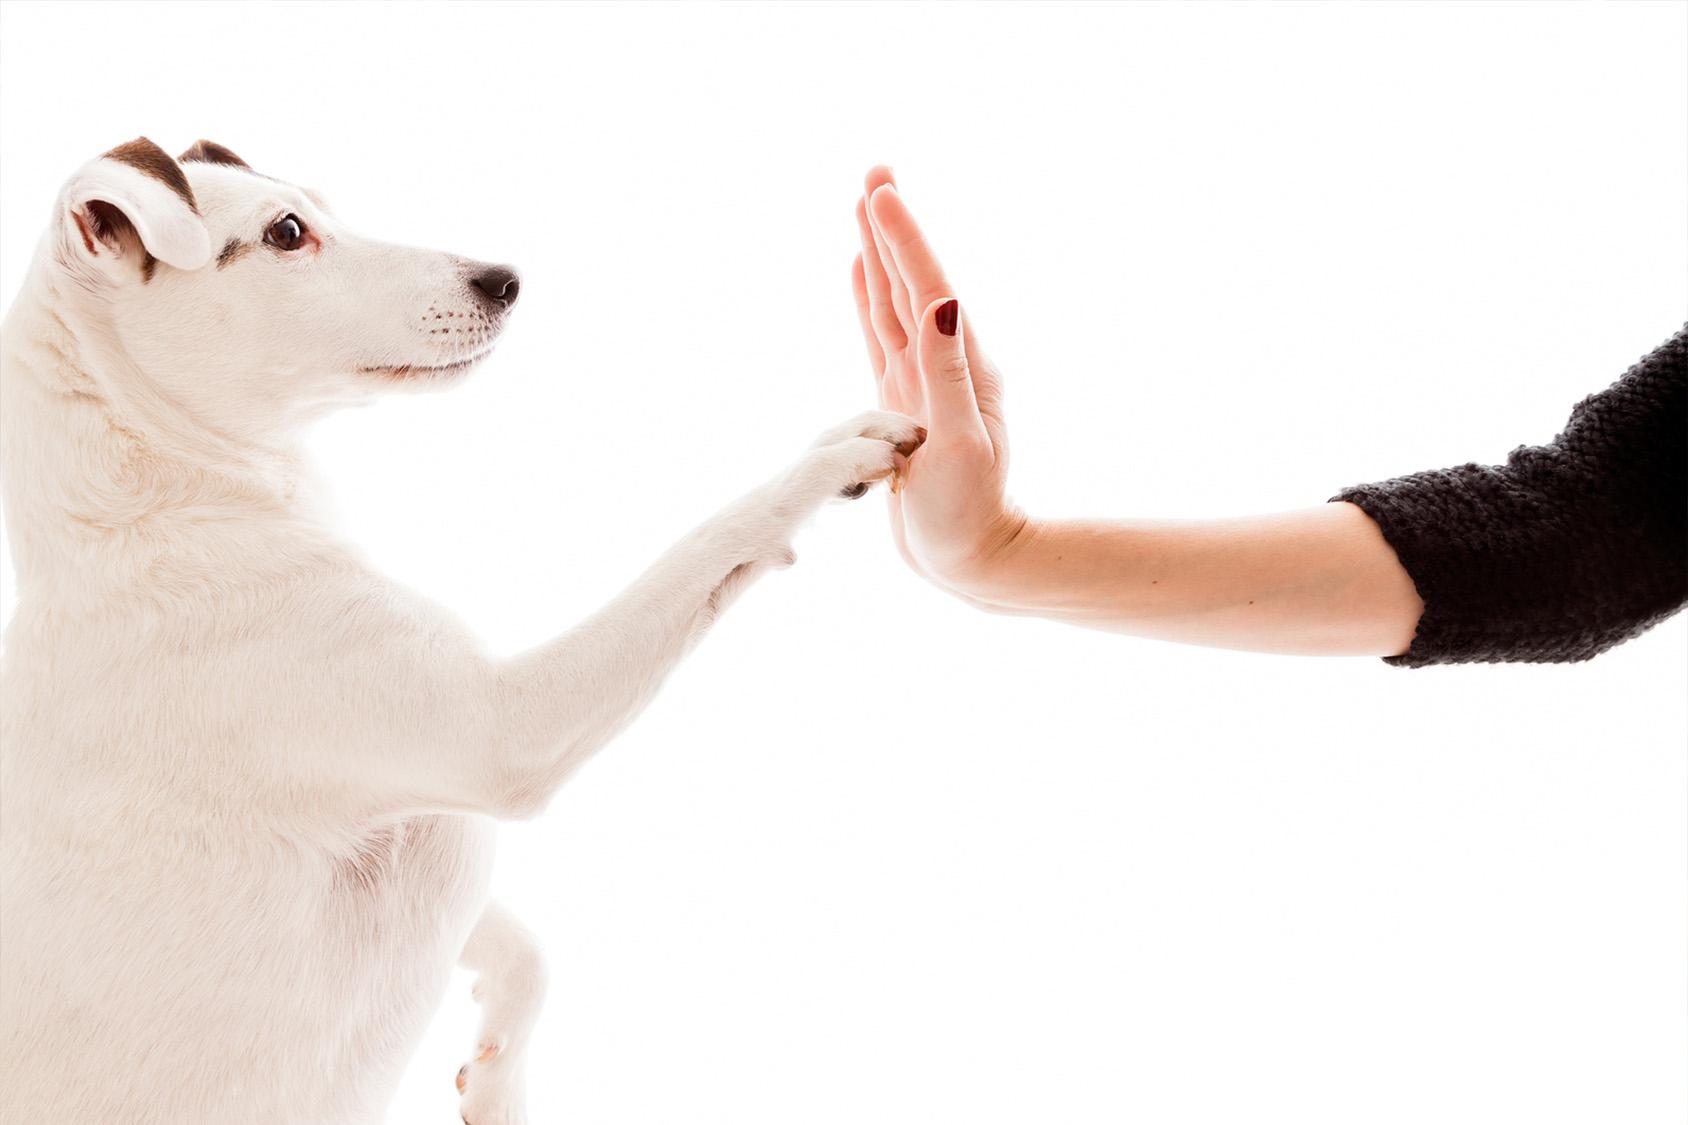 Blog cani : come funziona assicurazione cane?